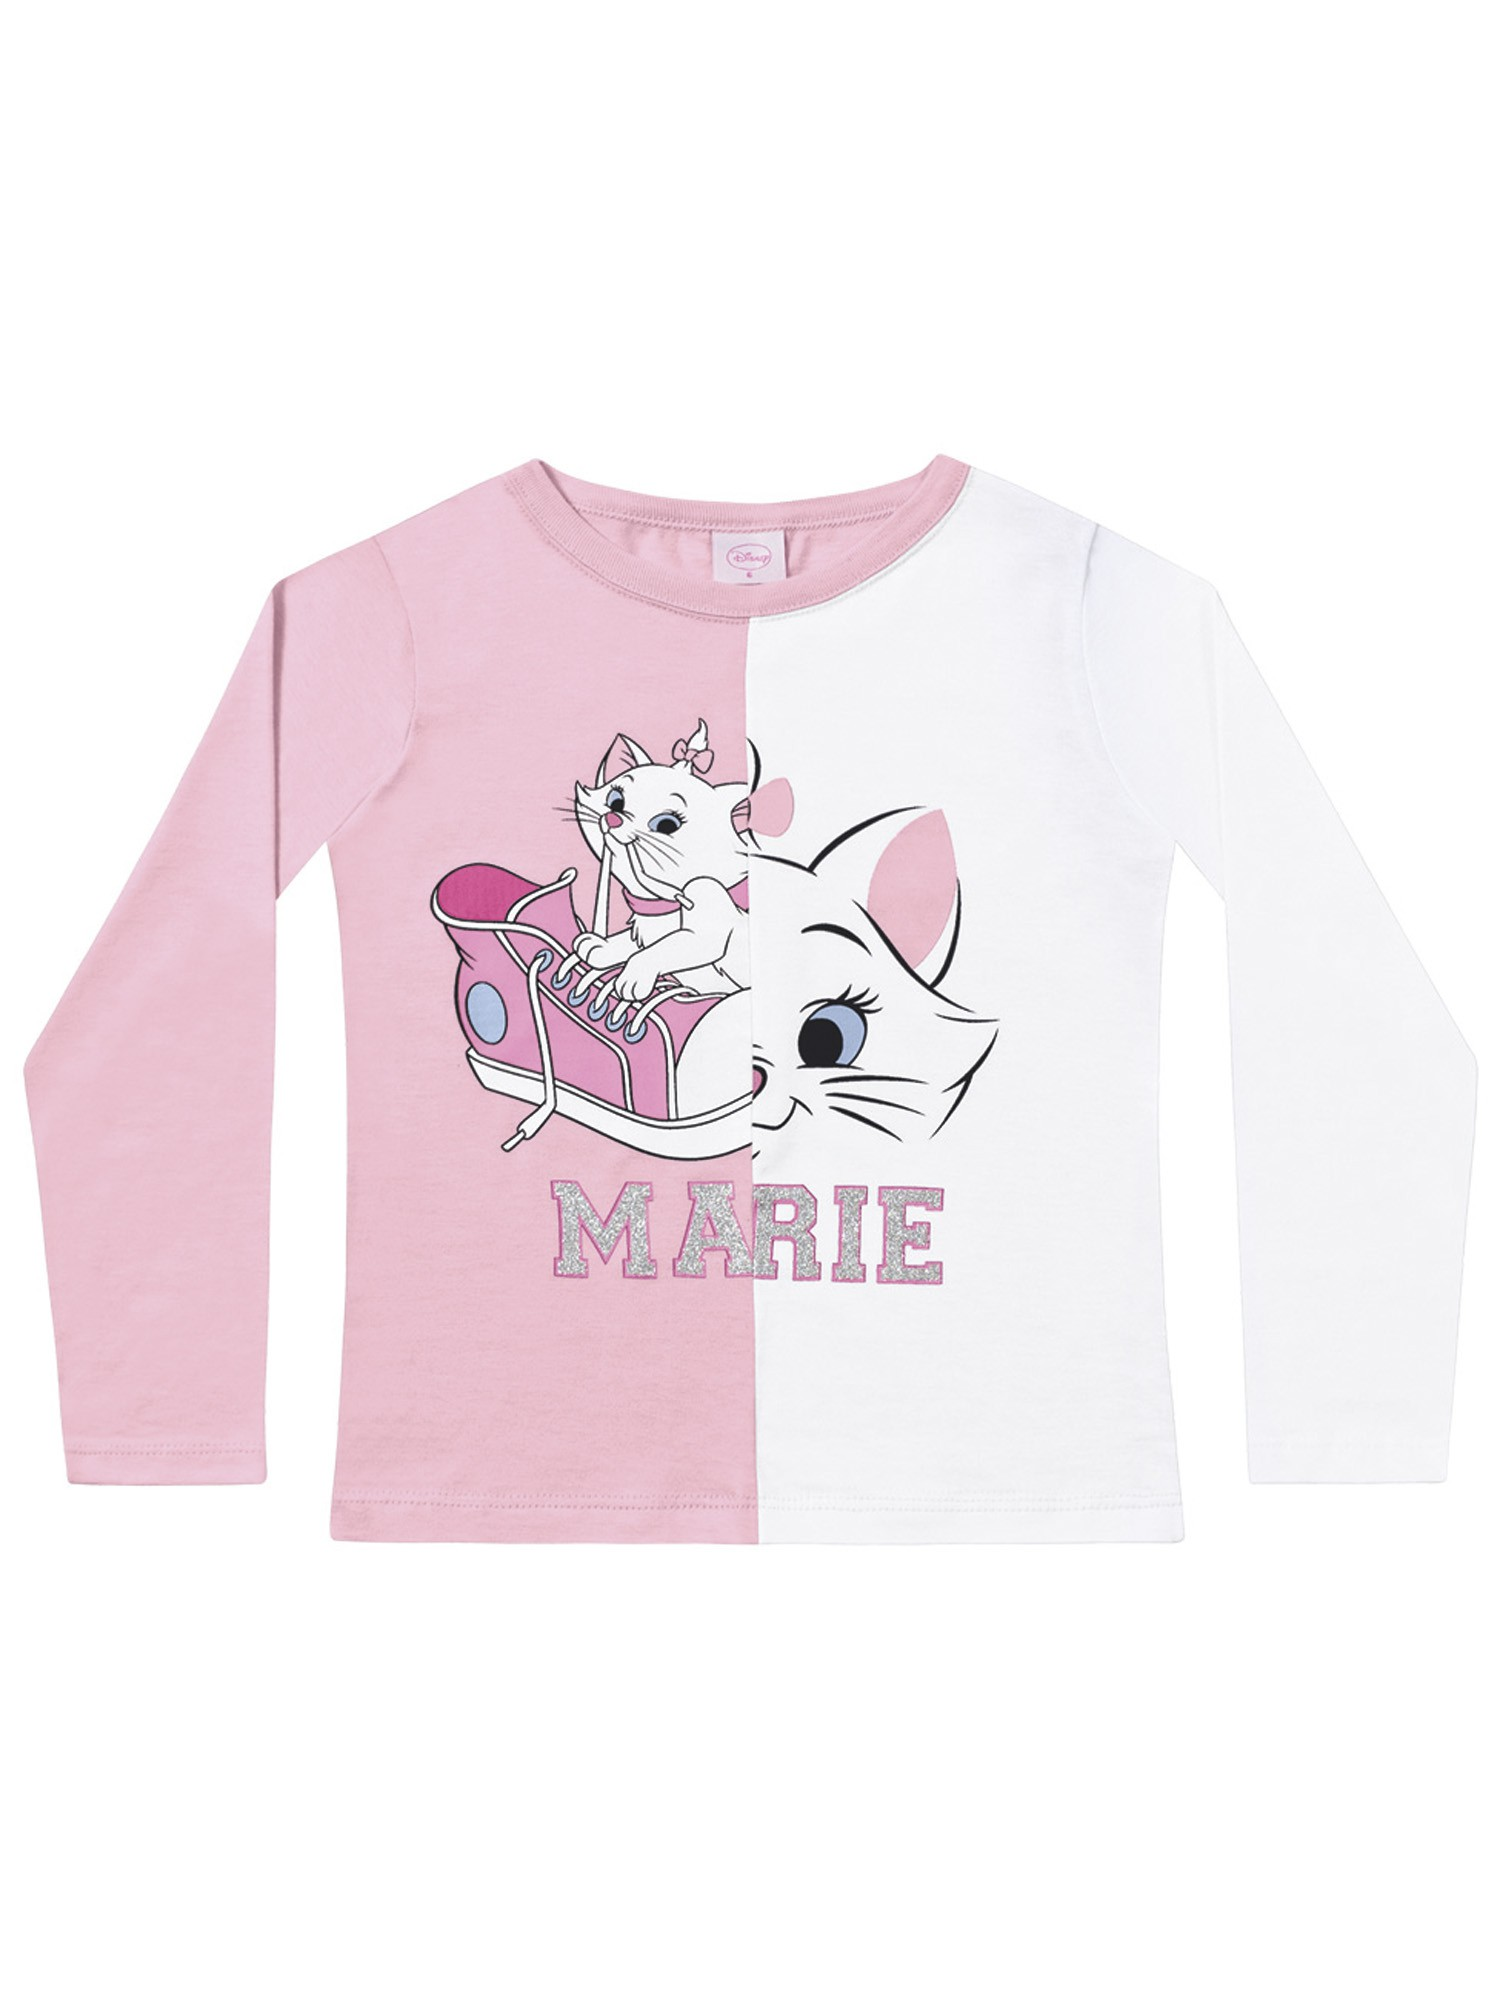 Blusa infantil feminina manga longa da Gatinha Marie - Disney Fakini